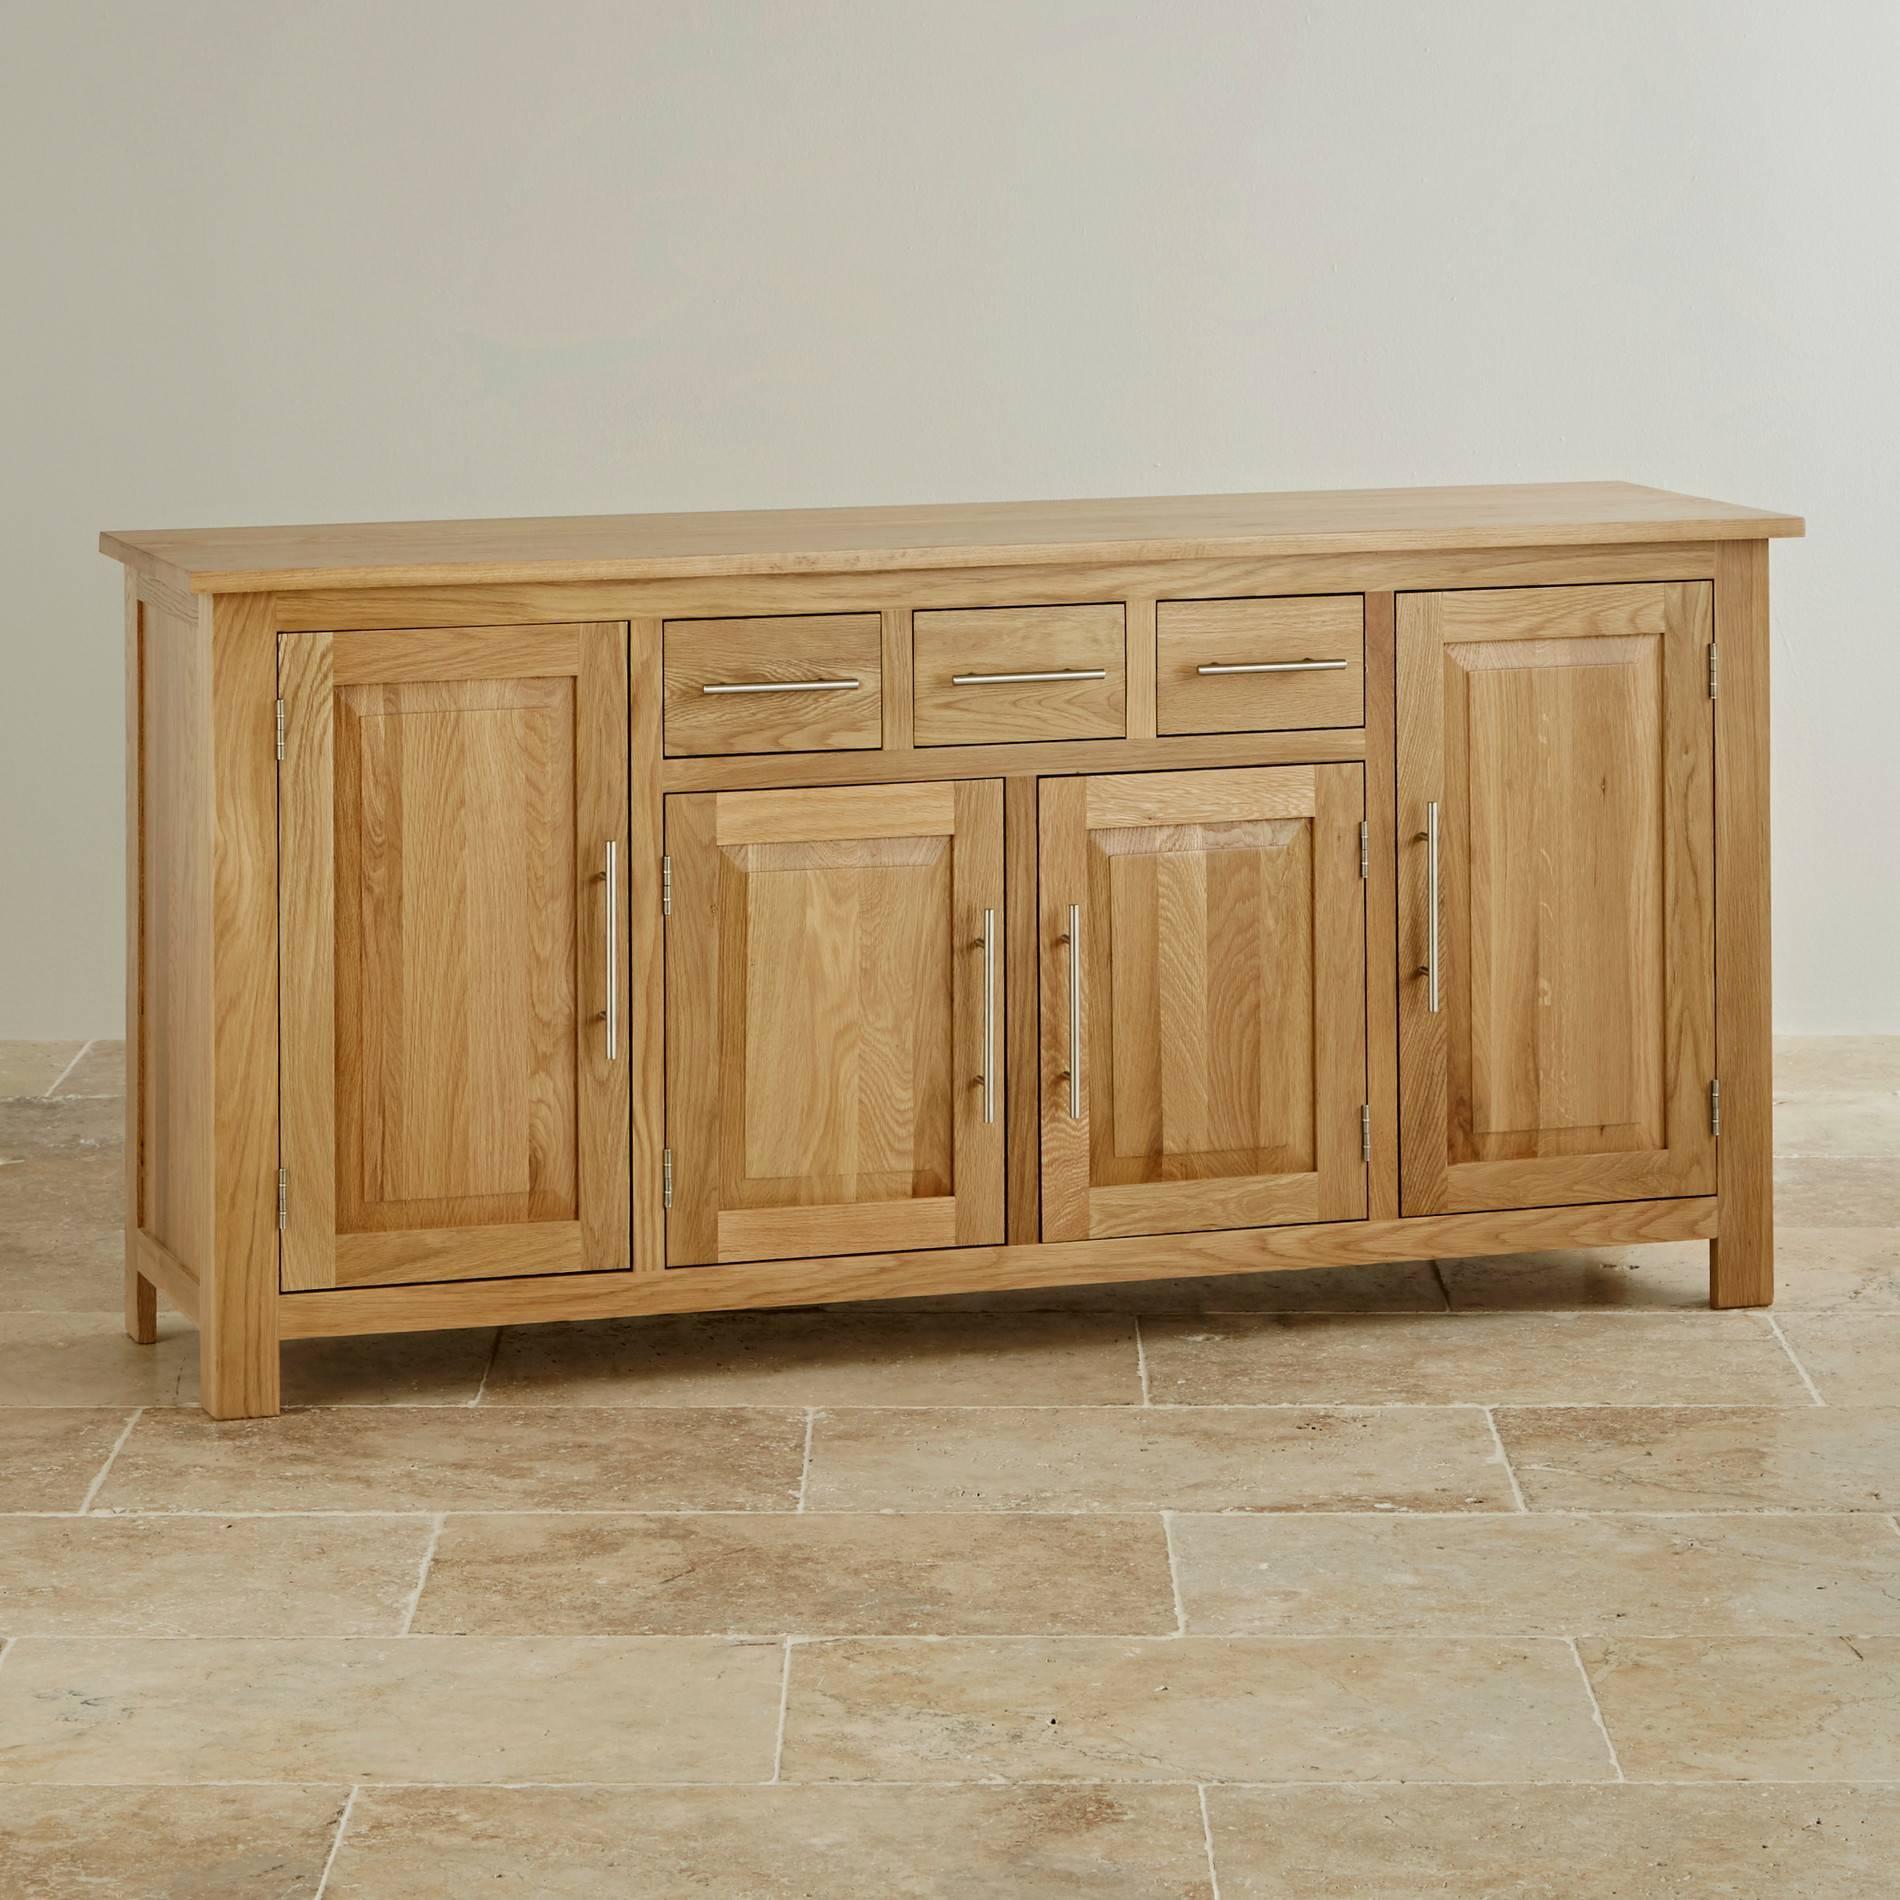 Rivermead Natural Solid Oak Large Sideboard | Oak Furniture Land Throughout 2018 Extra Large Oak Sideboards (View 8 of 15)